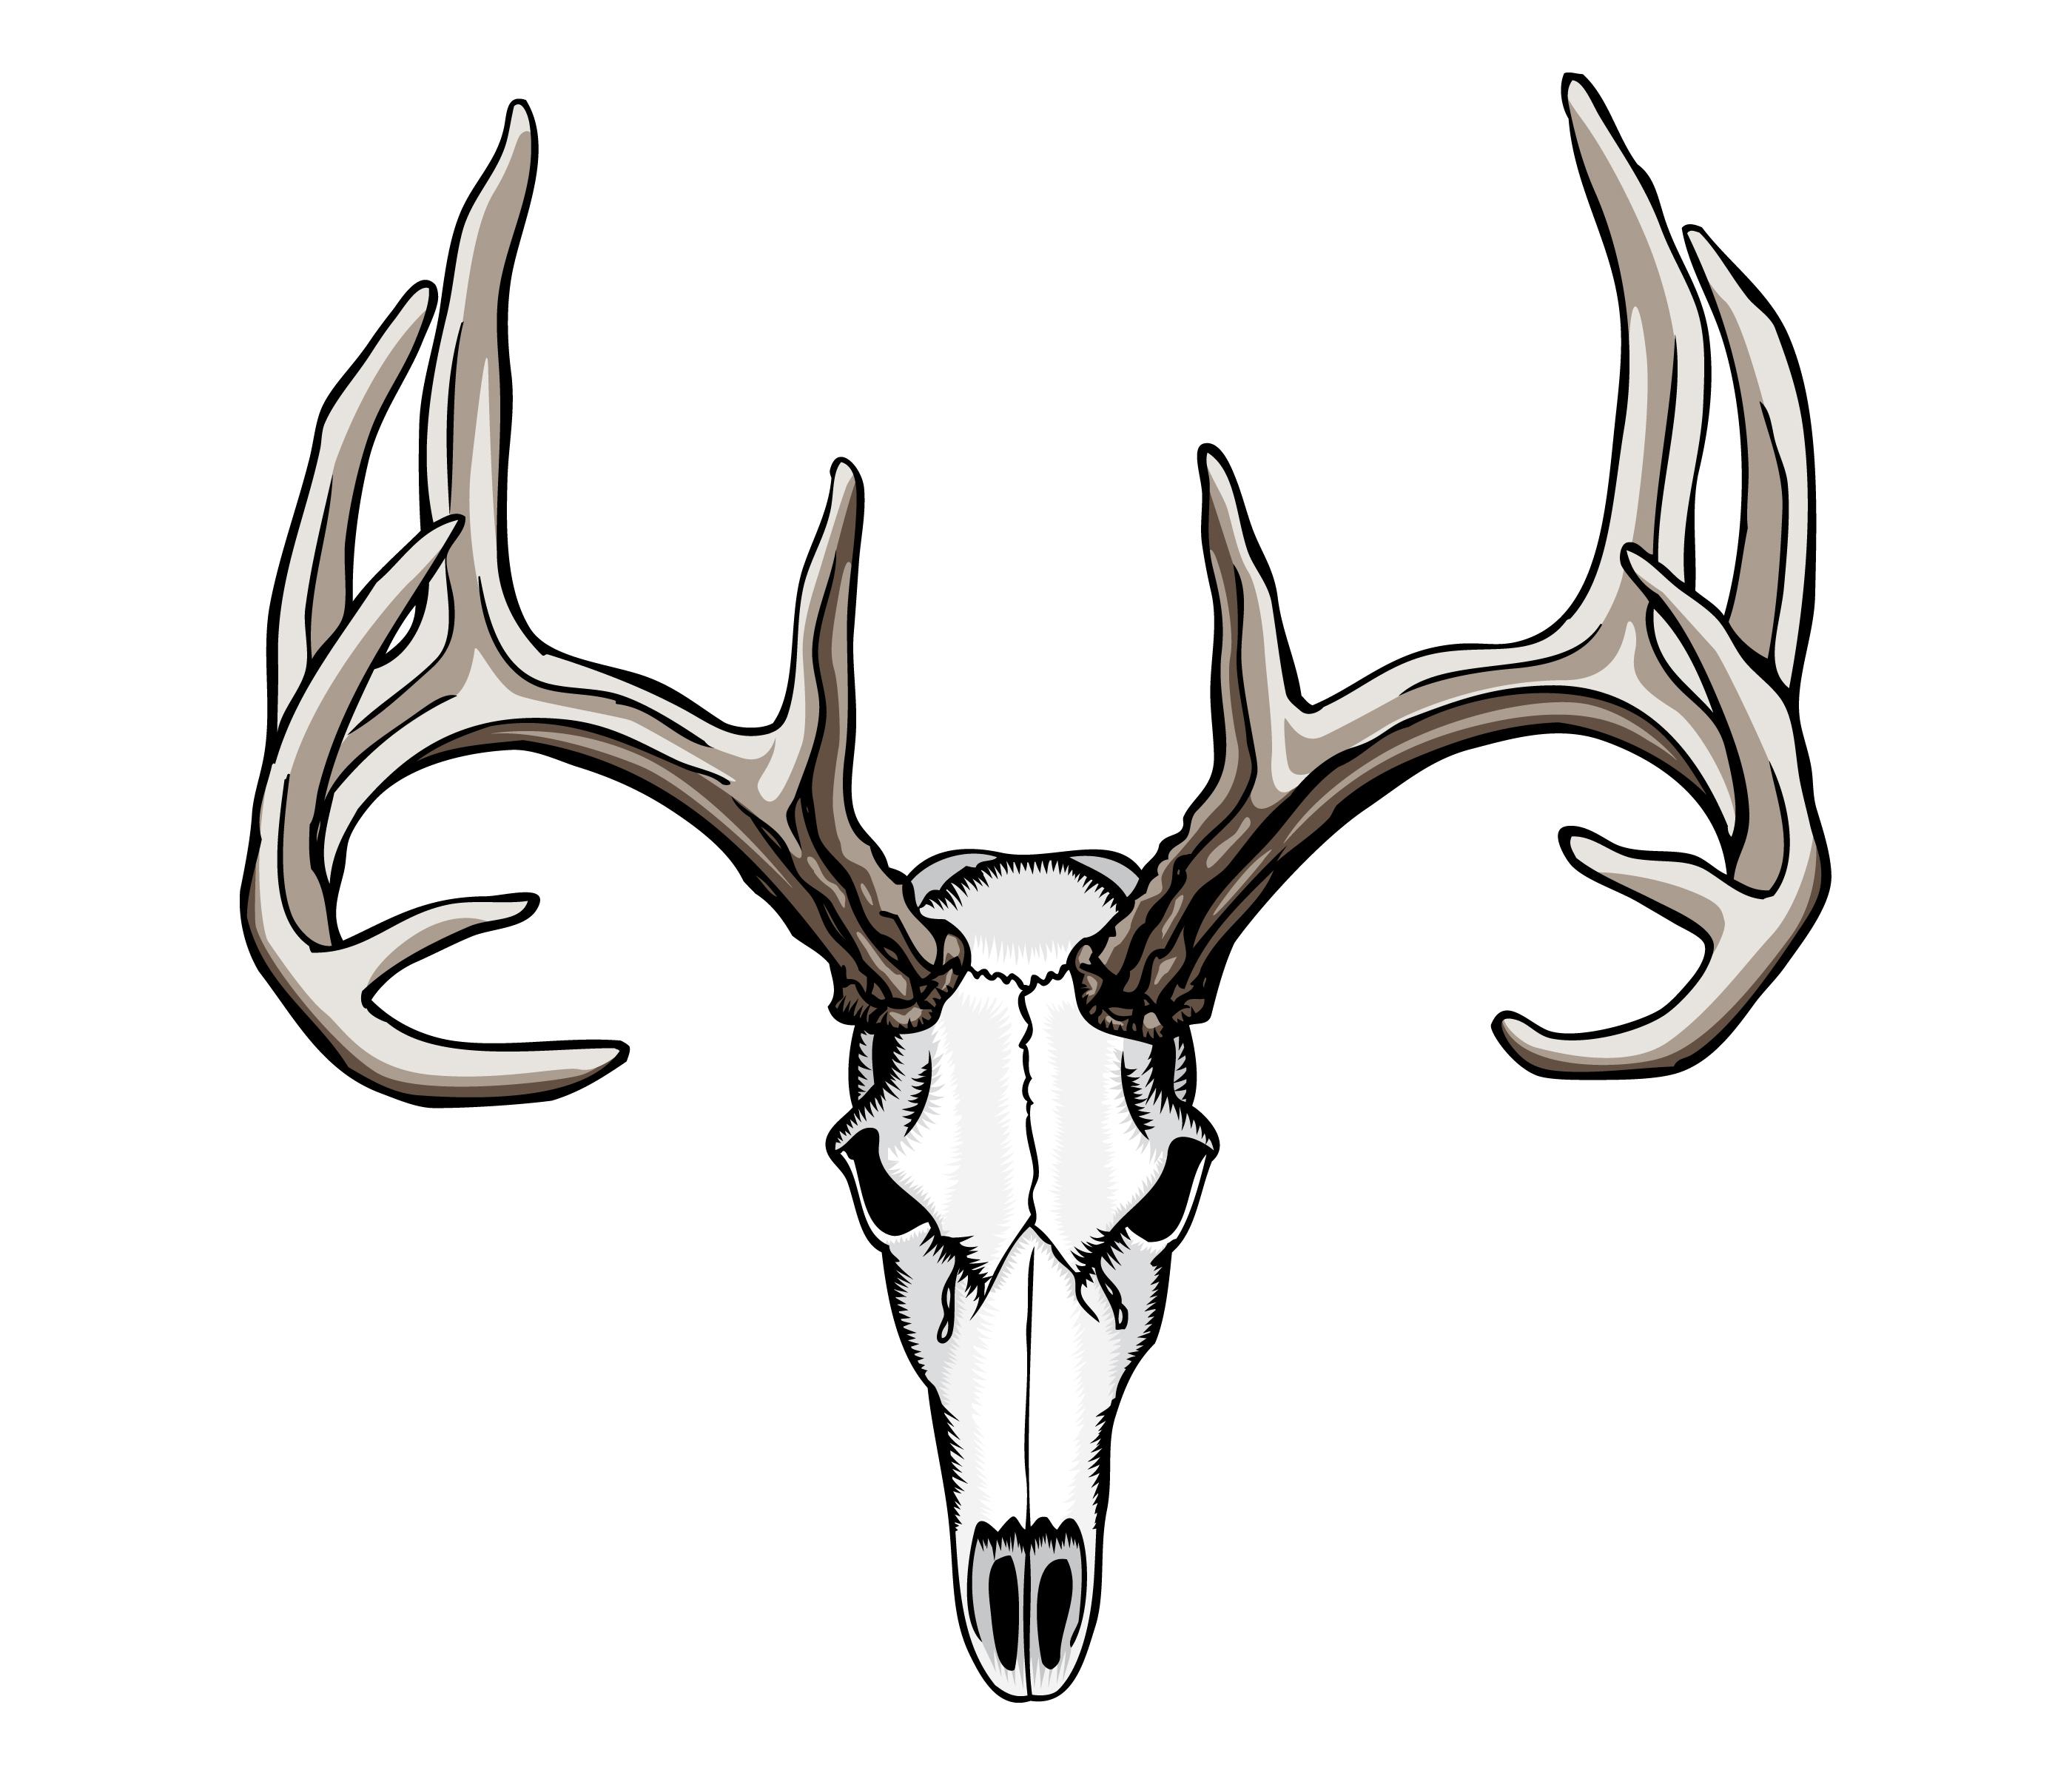 Deer Skull Drawing 21296 Whitetail Deer Skull Tattoos Jpg